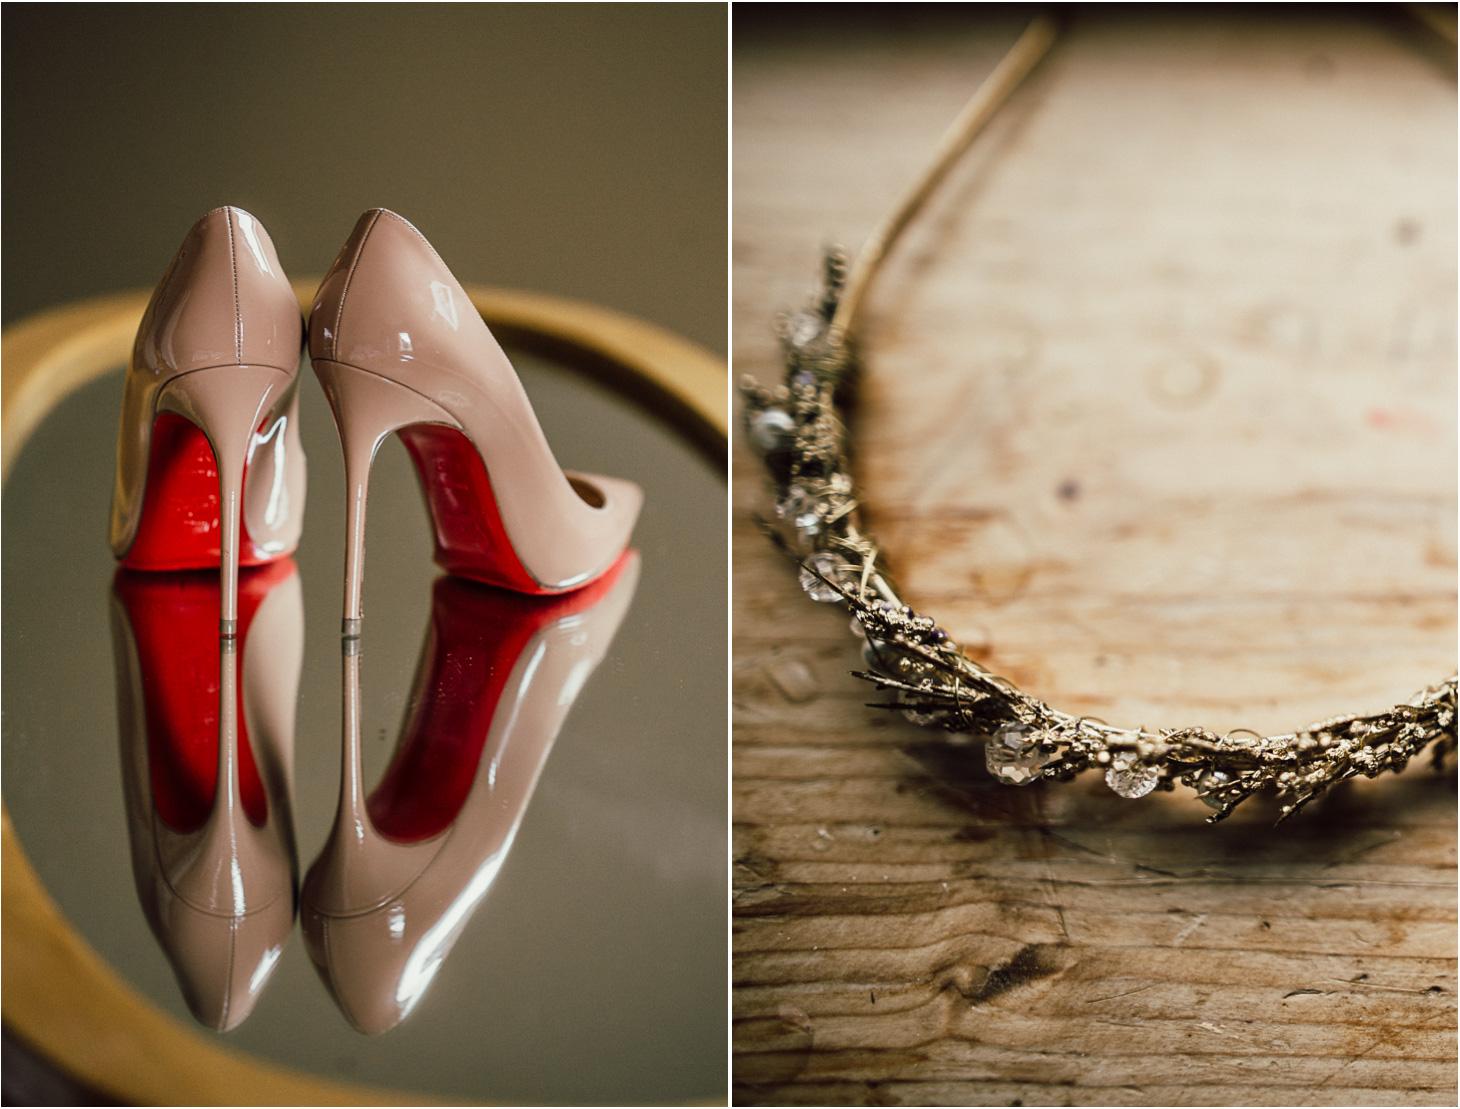 Virgina Lodge Photography. darren fitzpatrick. Wedding. 1